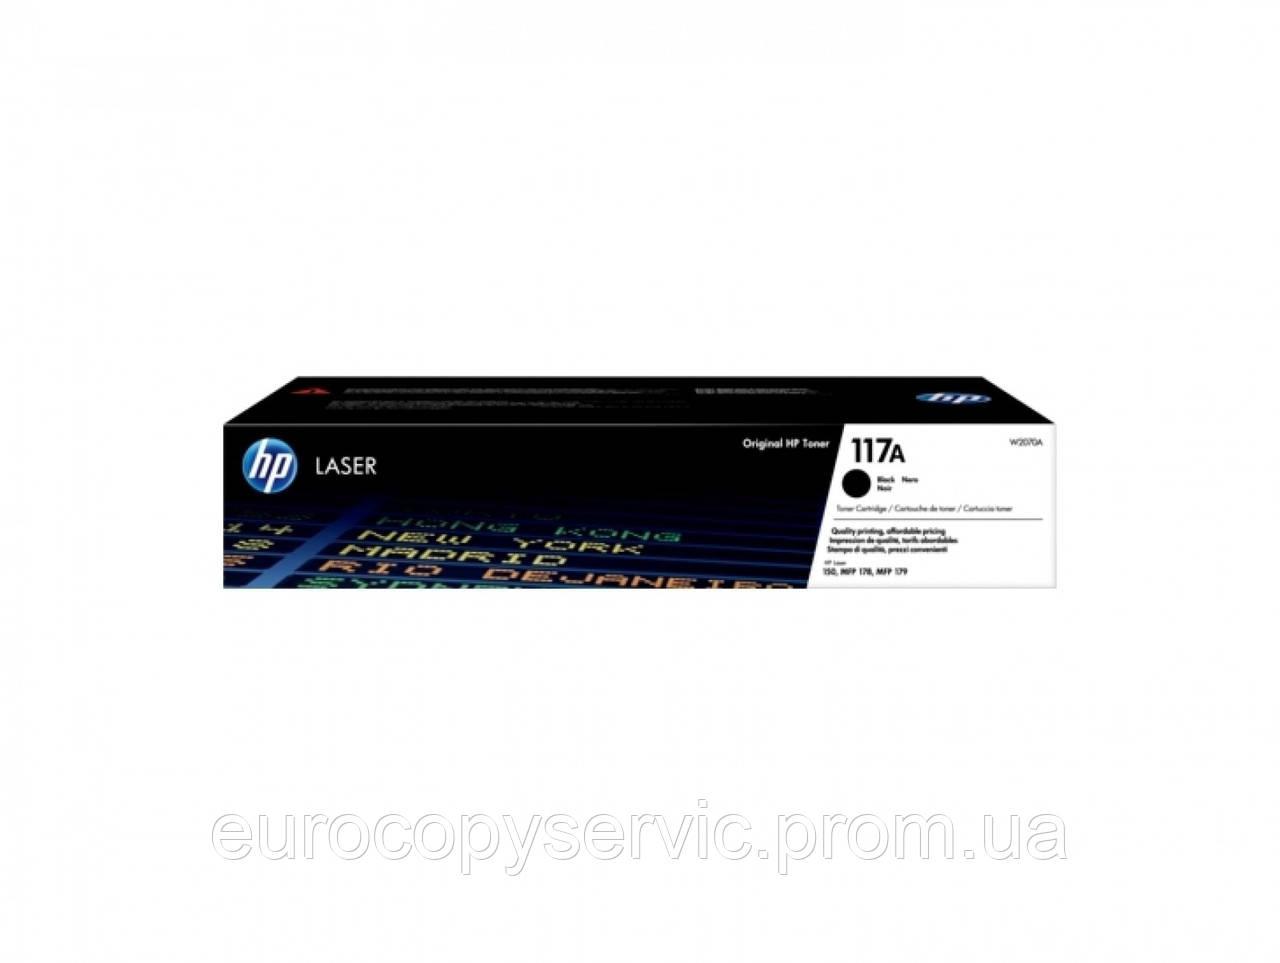 Тонер-картридж HP 117A Black Laser (W2070A) Original